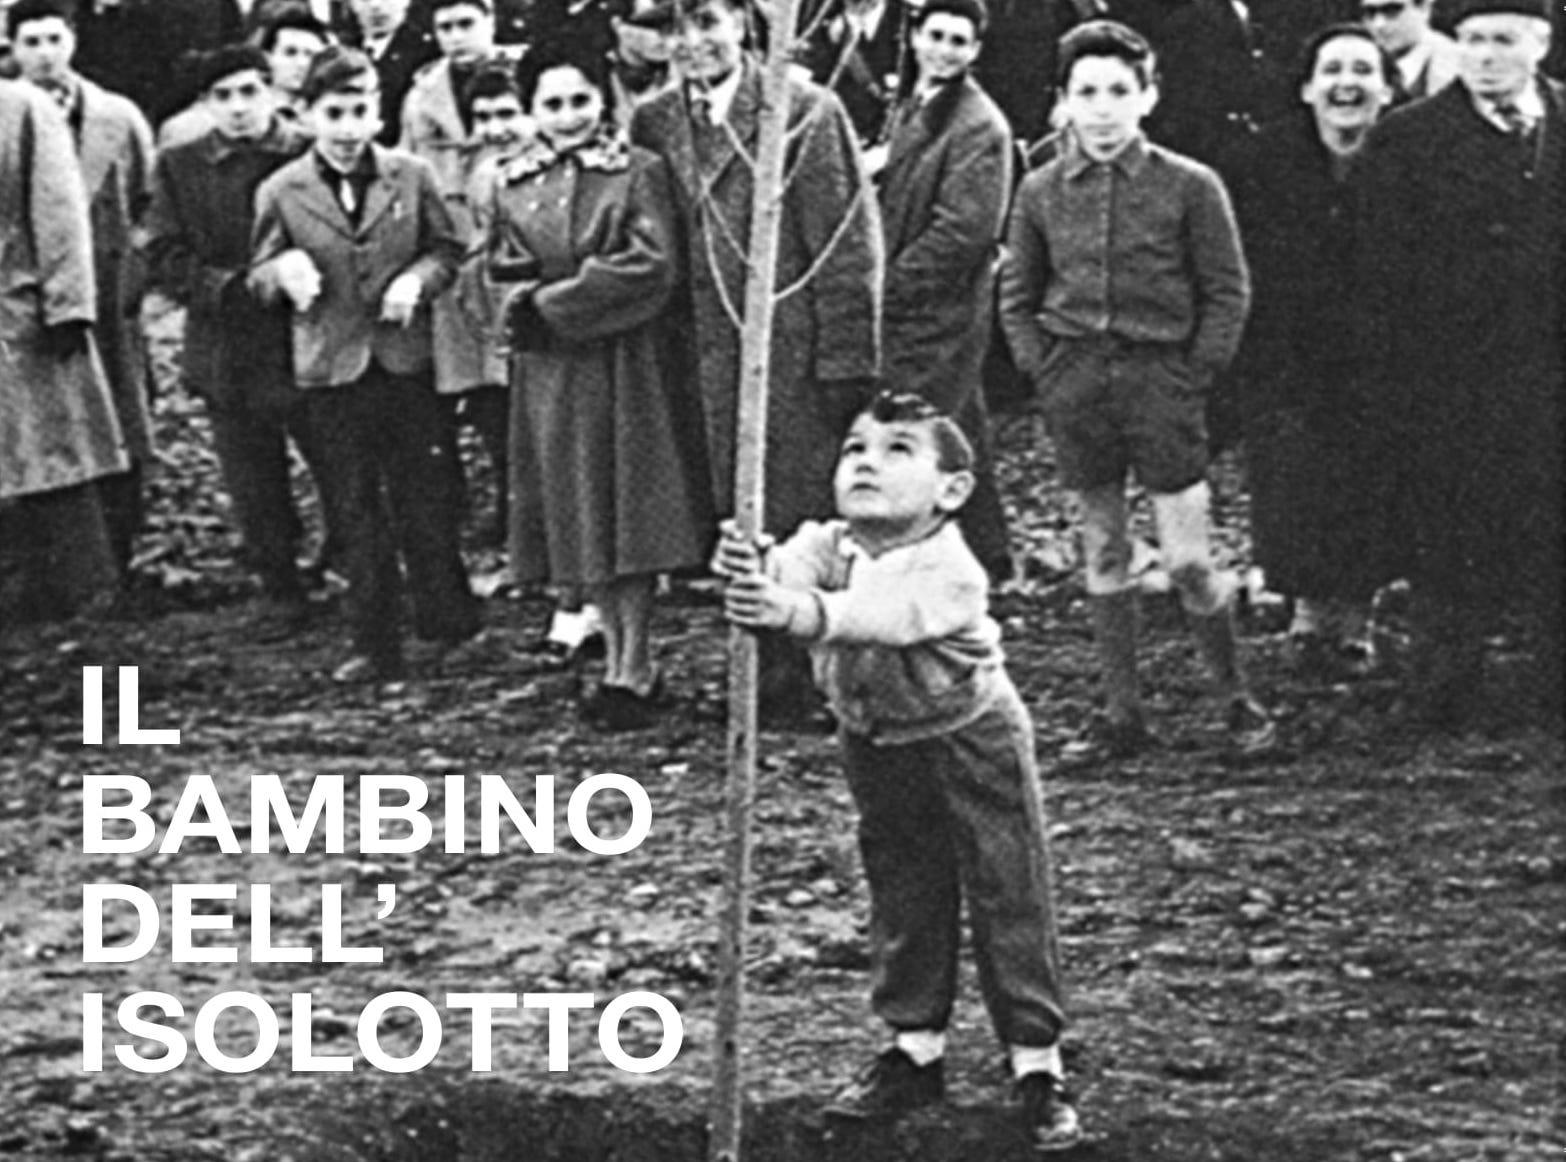 BAMBINO_ISOLOTTO